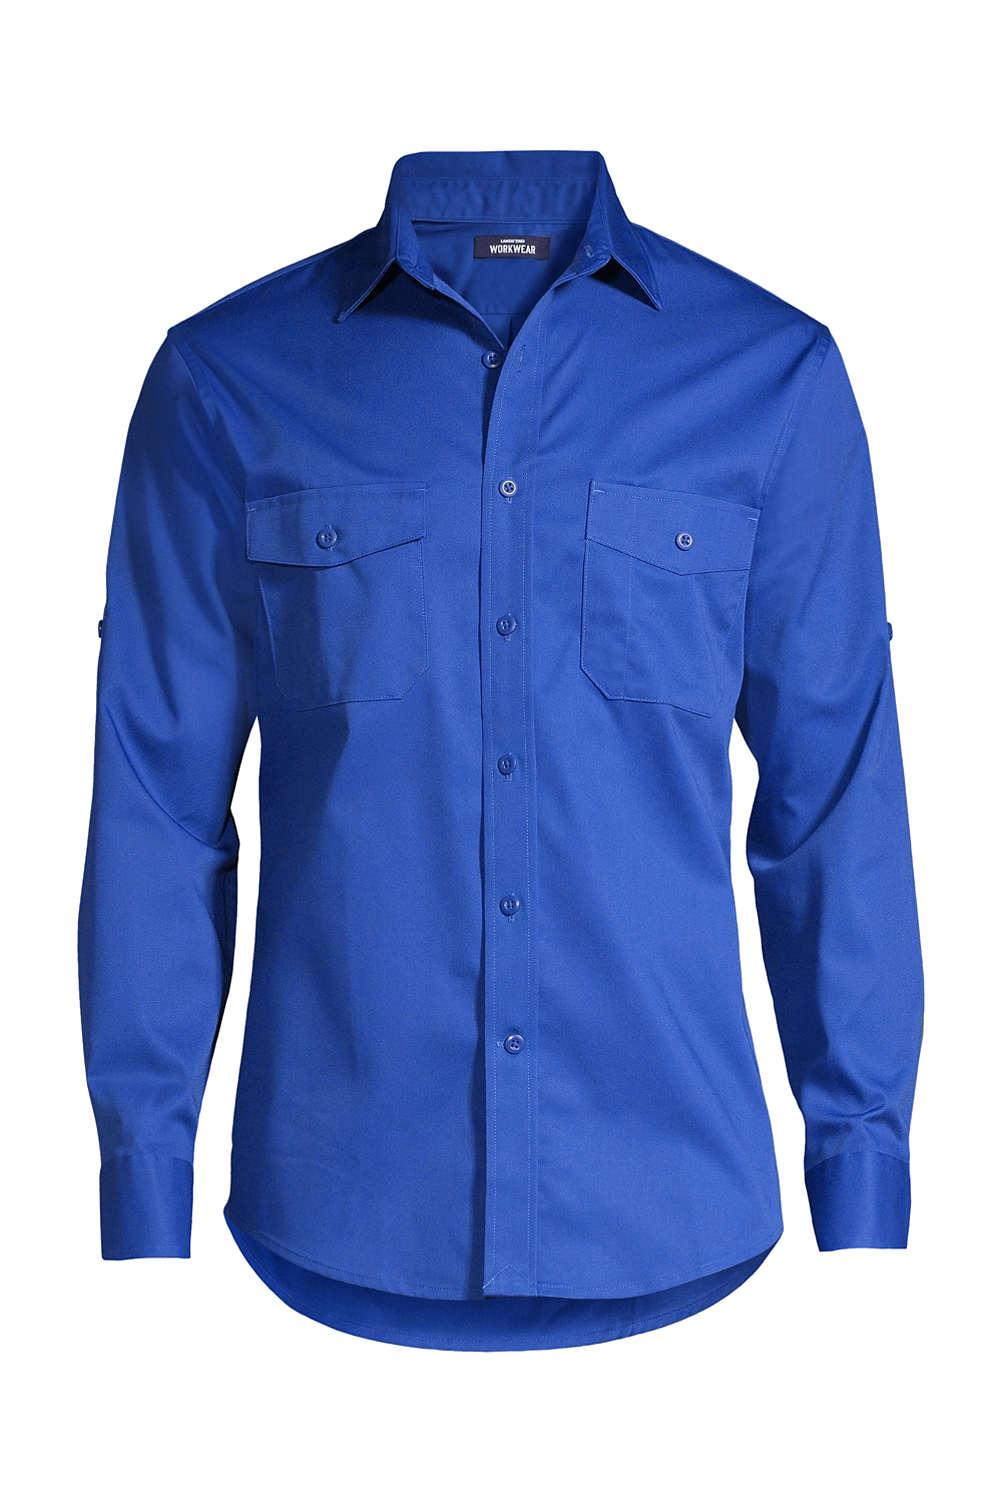 Men S Long Sleeve Straight Collar Work Shirt From Lands End